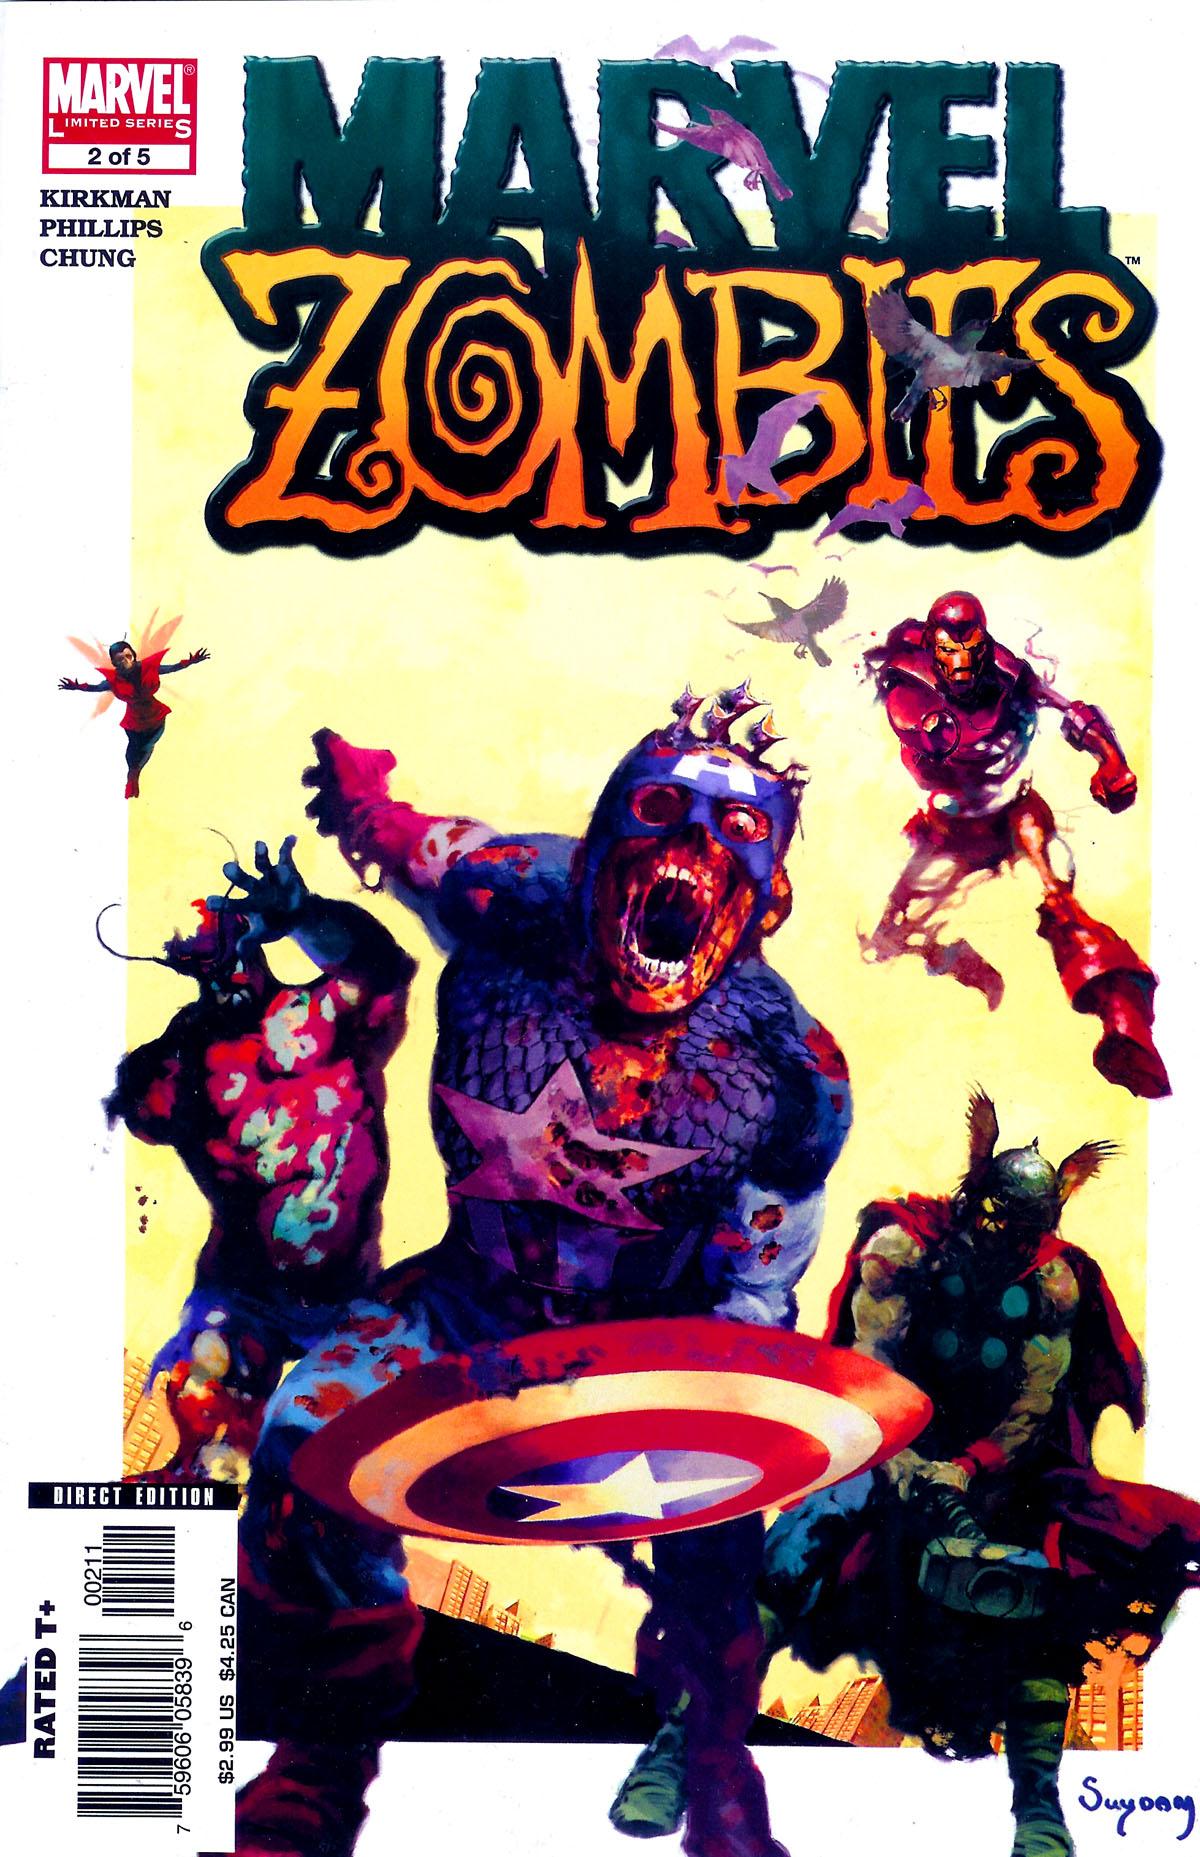 Marvel zombies vol 1 marvel database fandom powered by wikia - Marvel spiderman comics pdf ...